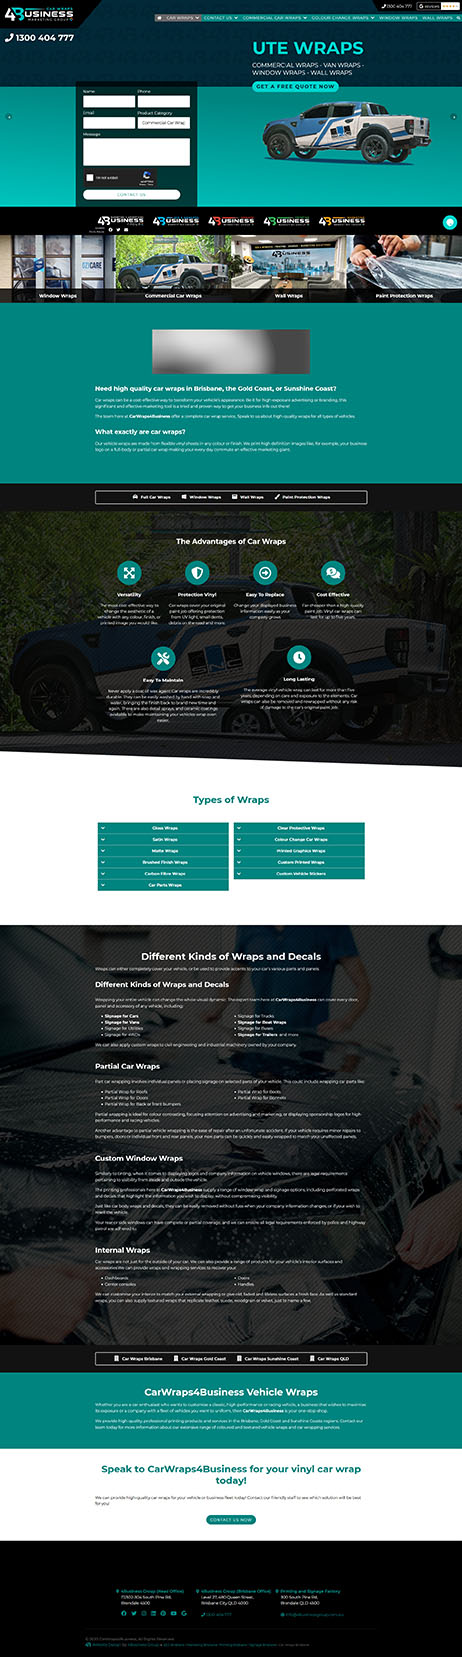 CarWraps4Business: Desktop View